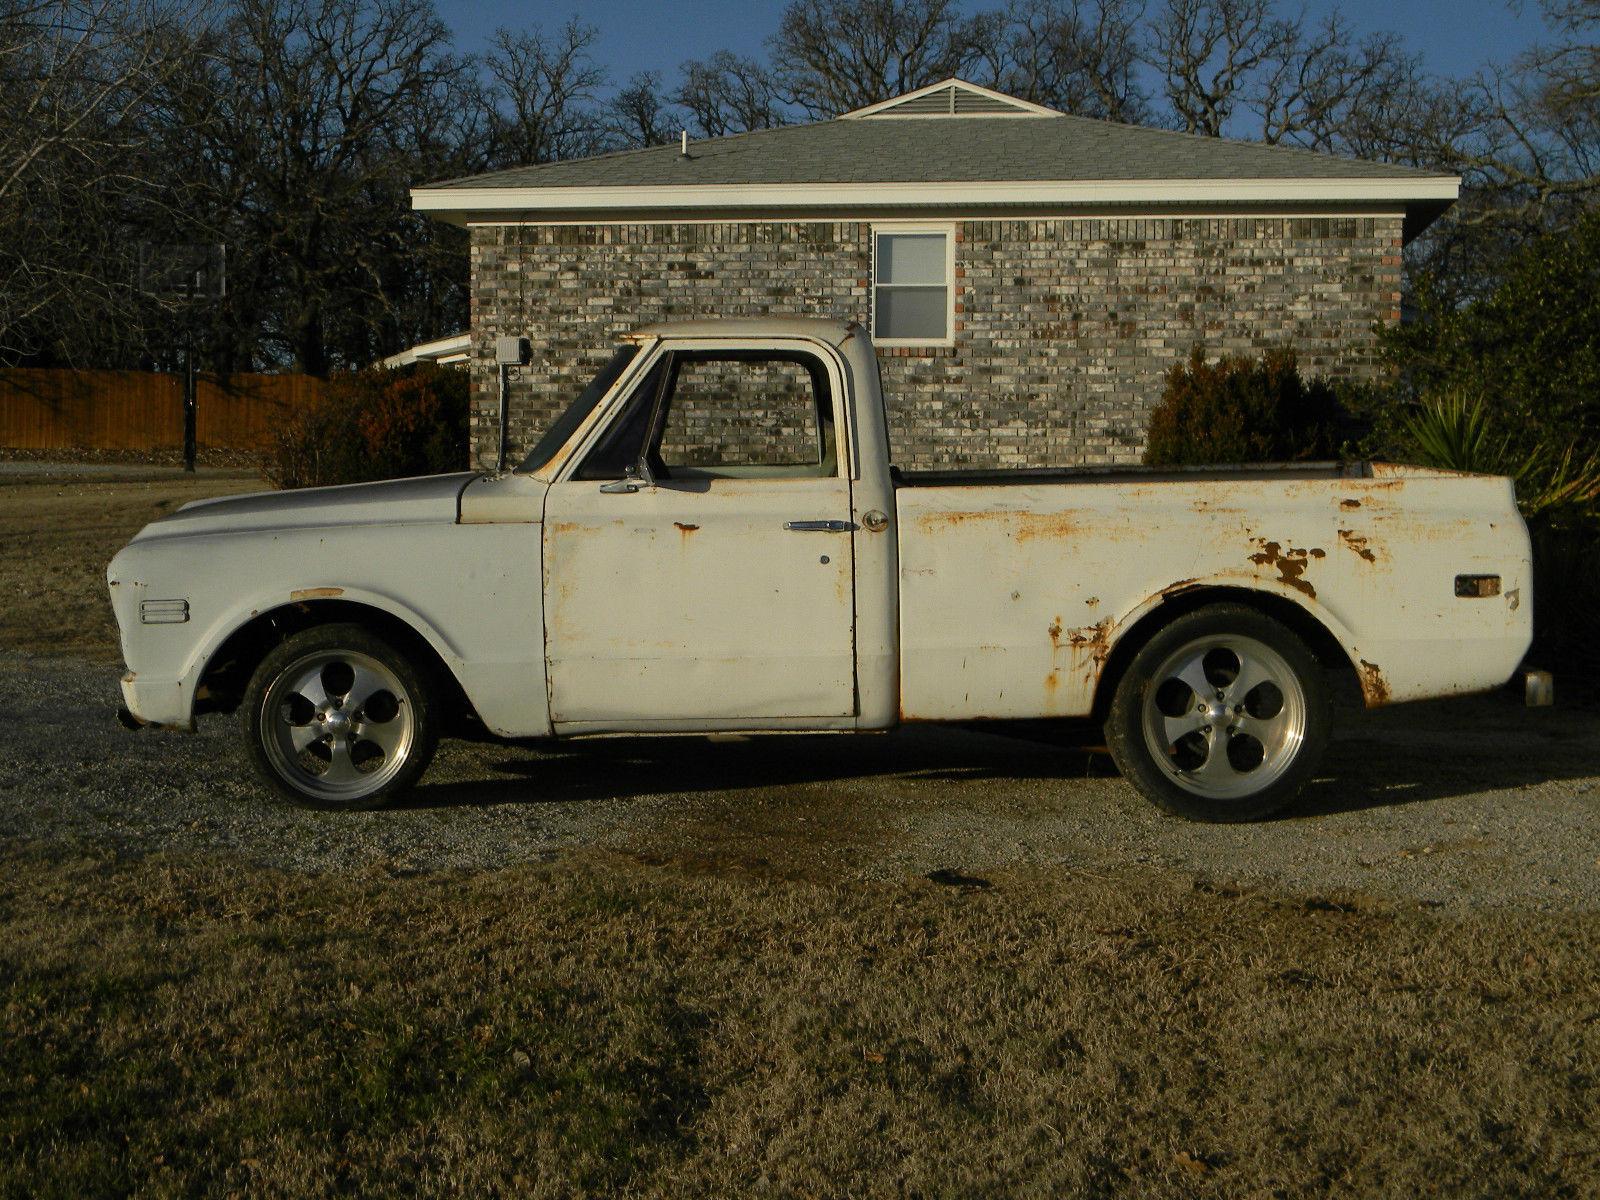 1968 Chevy C10 Swb Pickup Truck Project V8 A C Cab P S B 5 Lug 67 Pick Up Prevnext